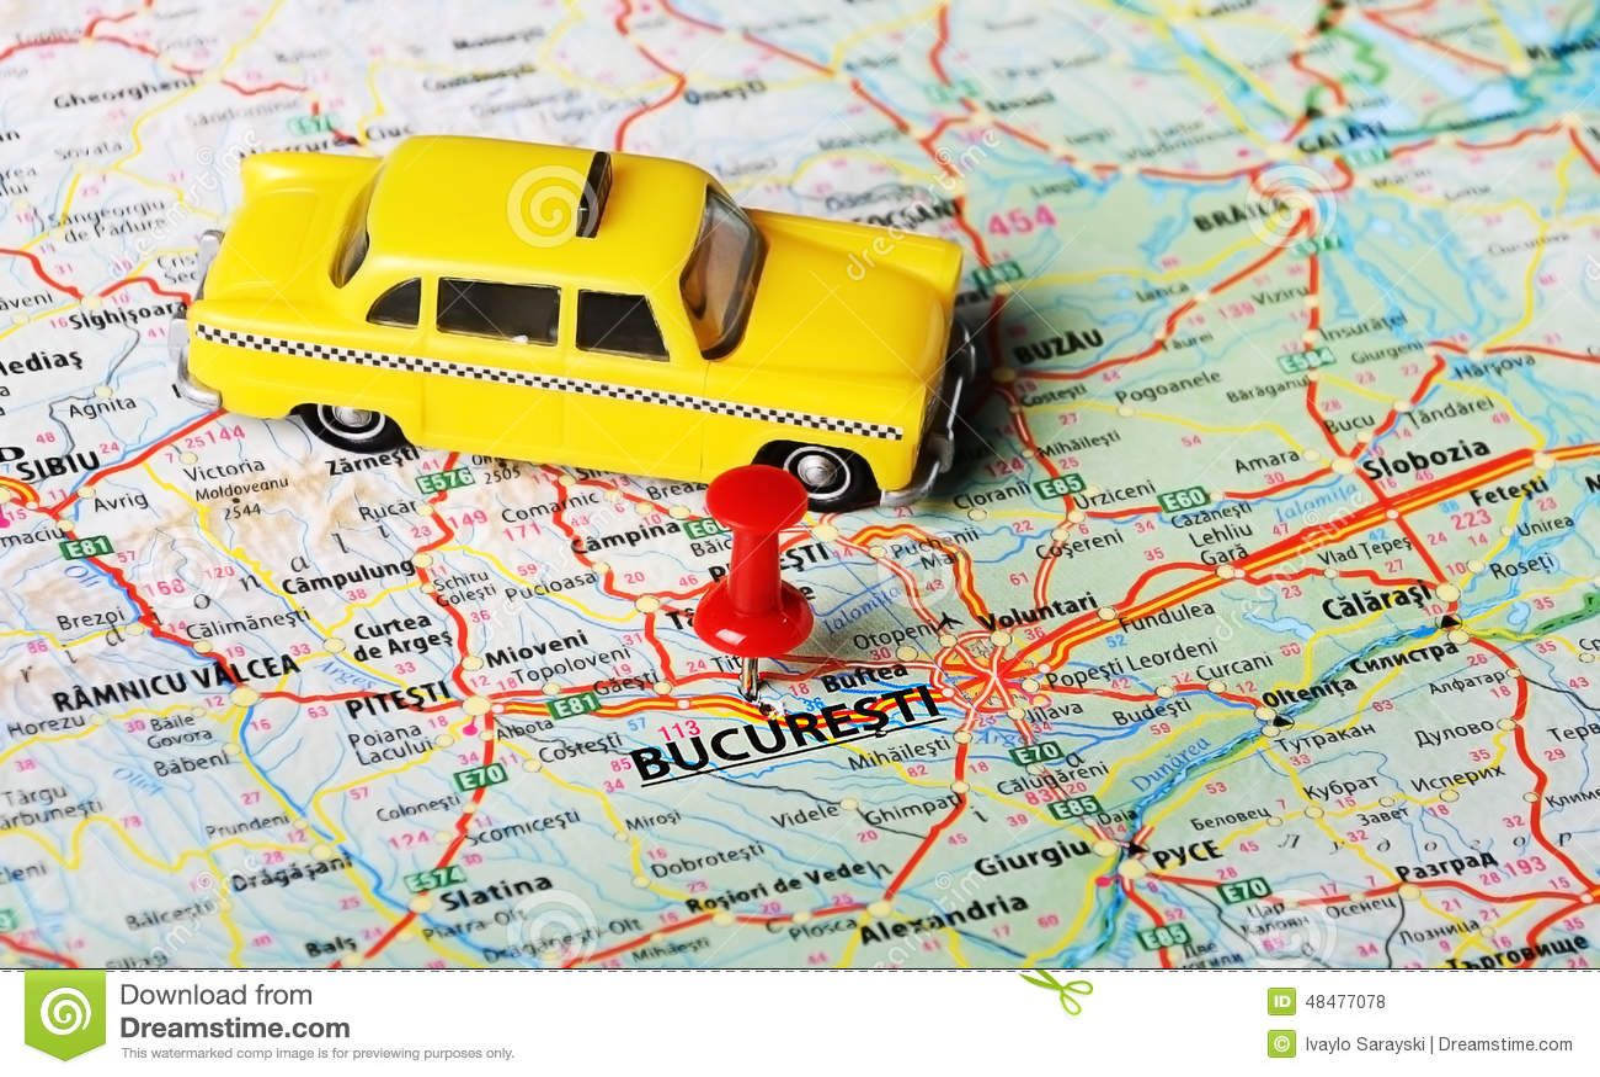 Bucuresti Romania Map Taxi Stock Photo Image - Romania map